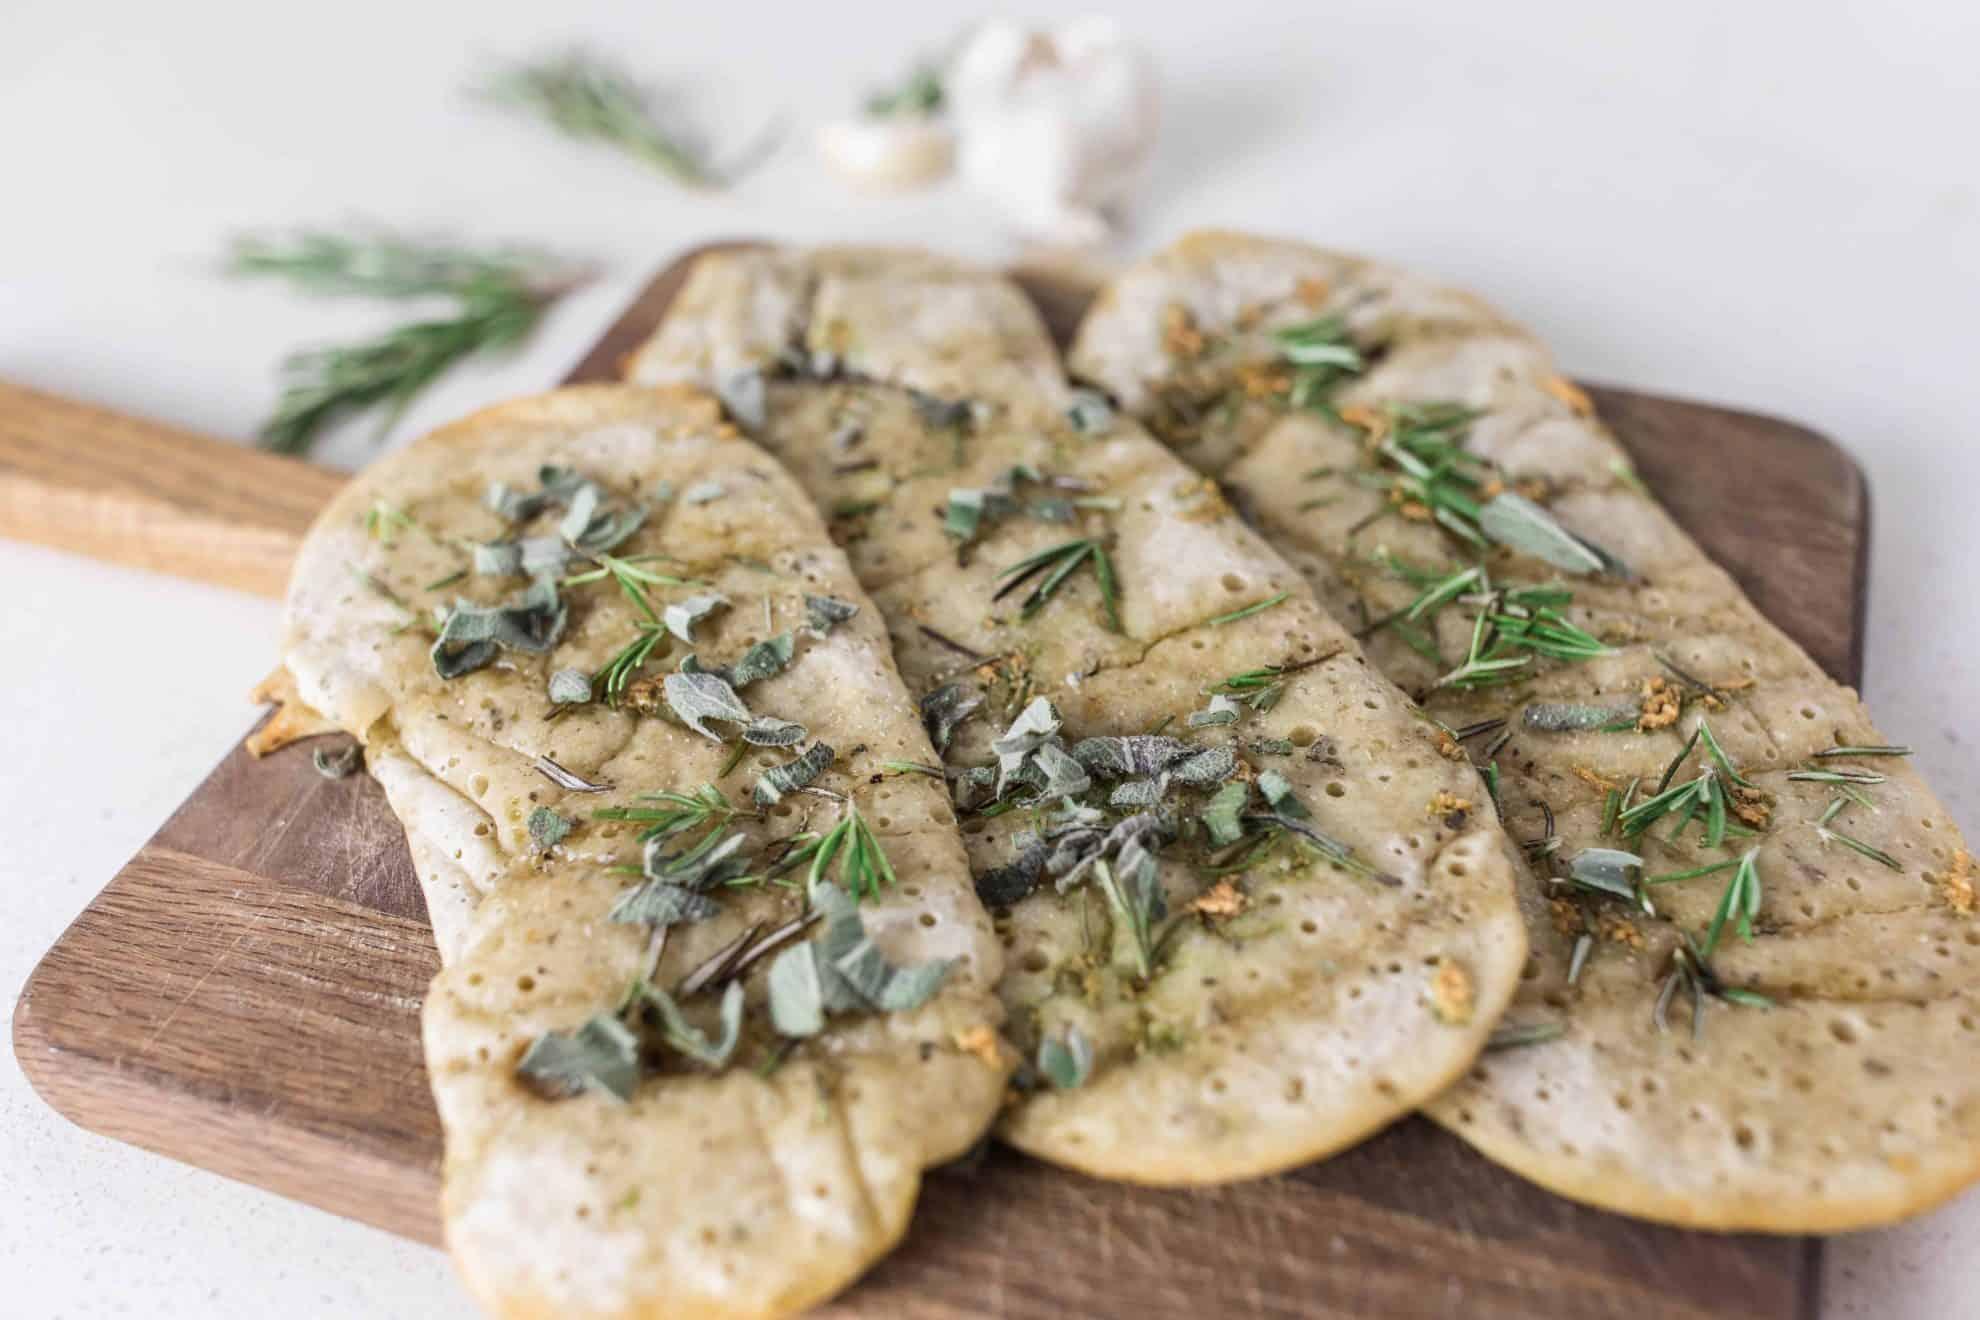 Easy Sourdough Flatbread with garlic and herbs no wait sourdough recipe